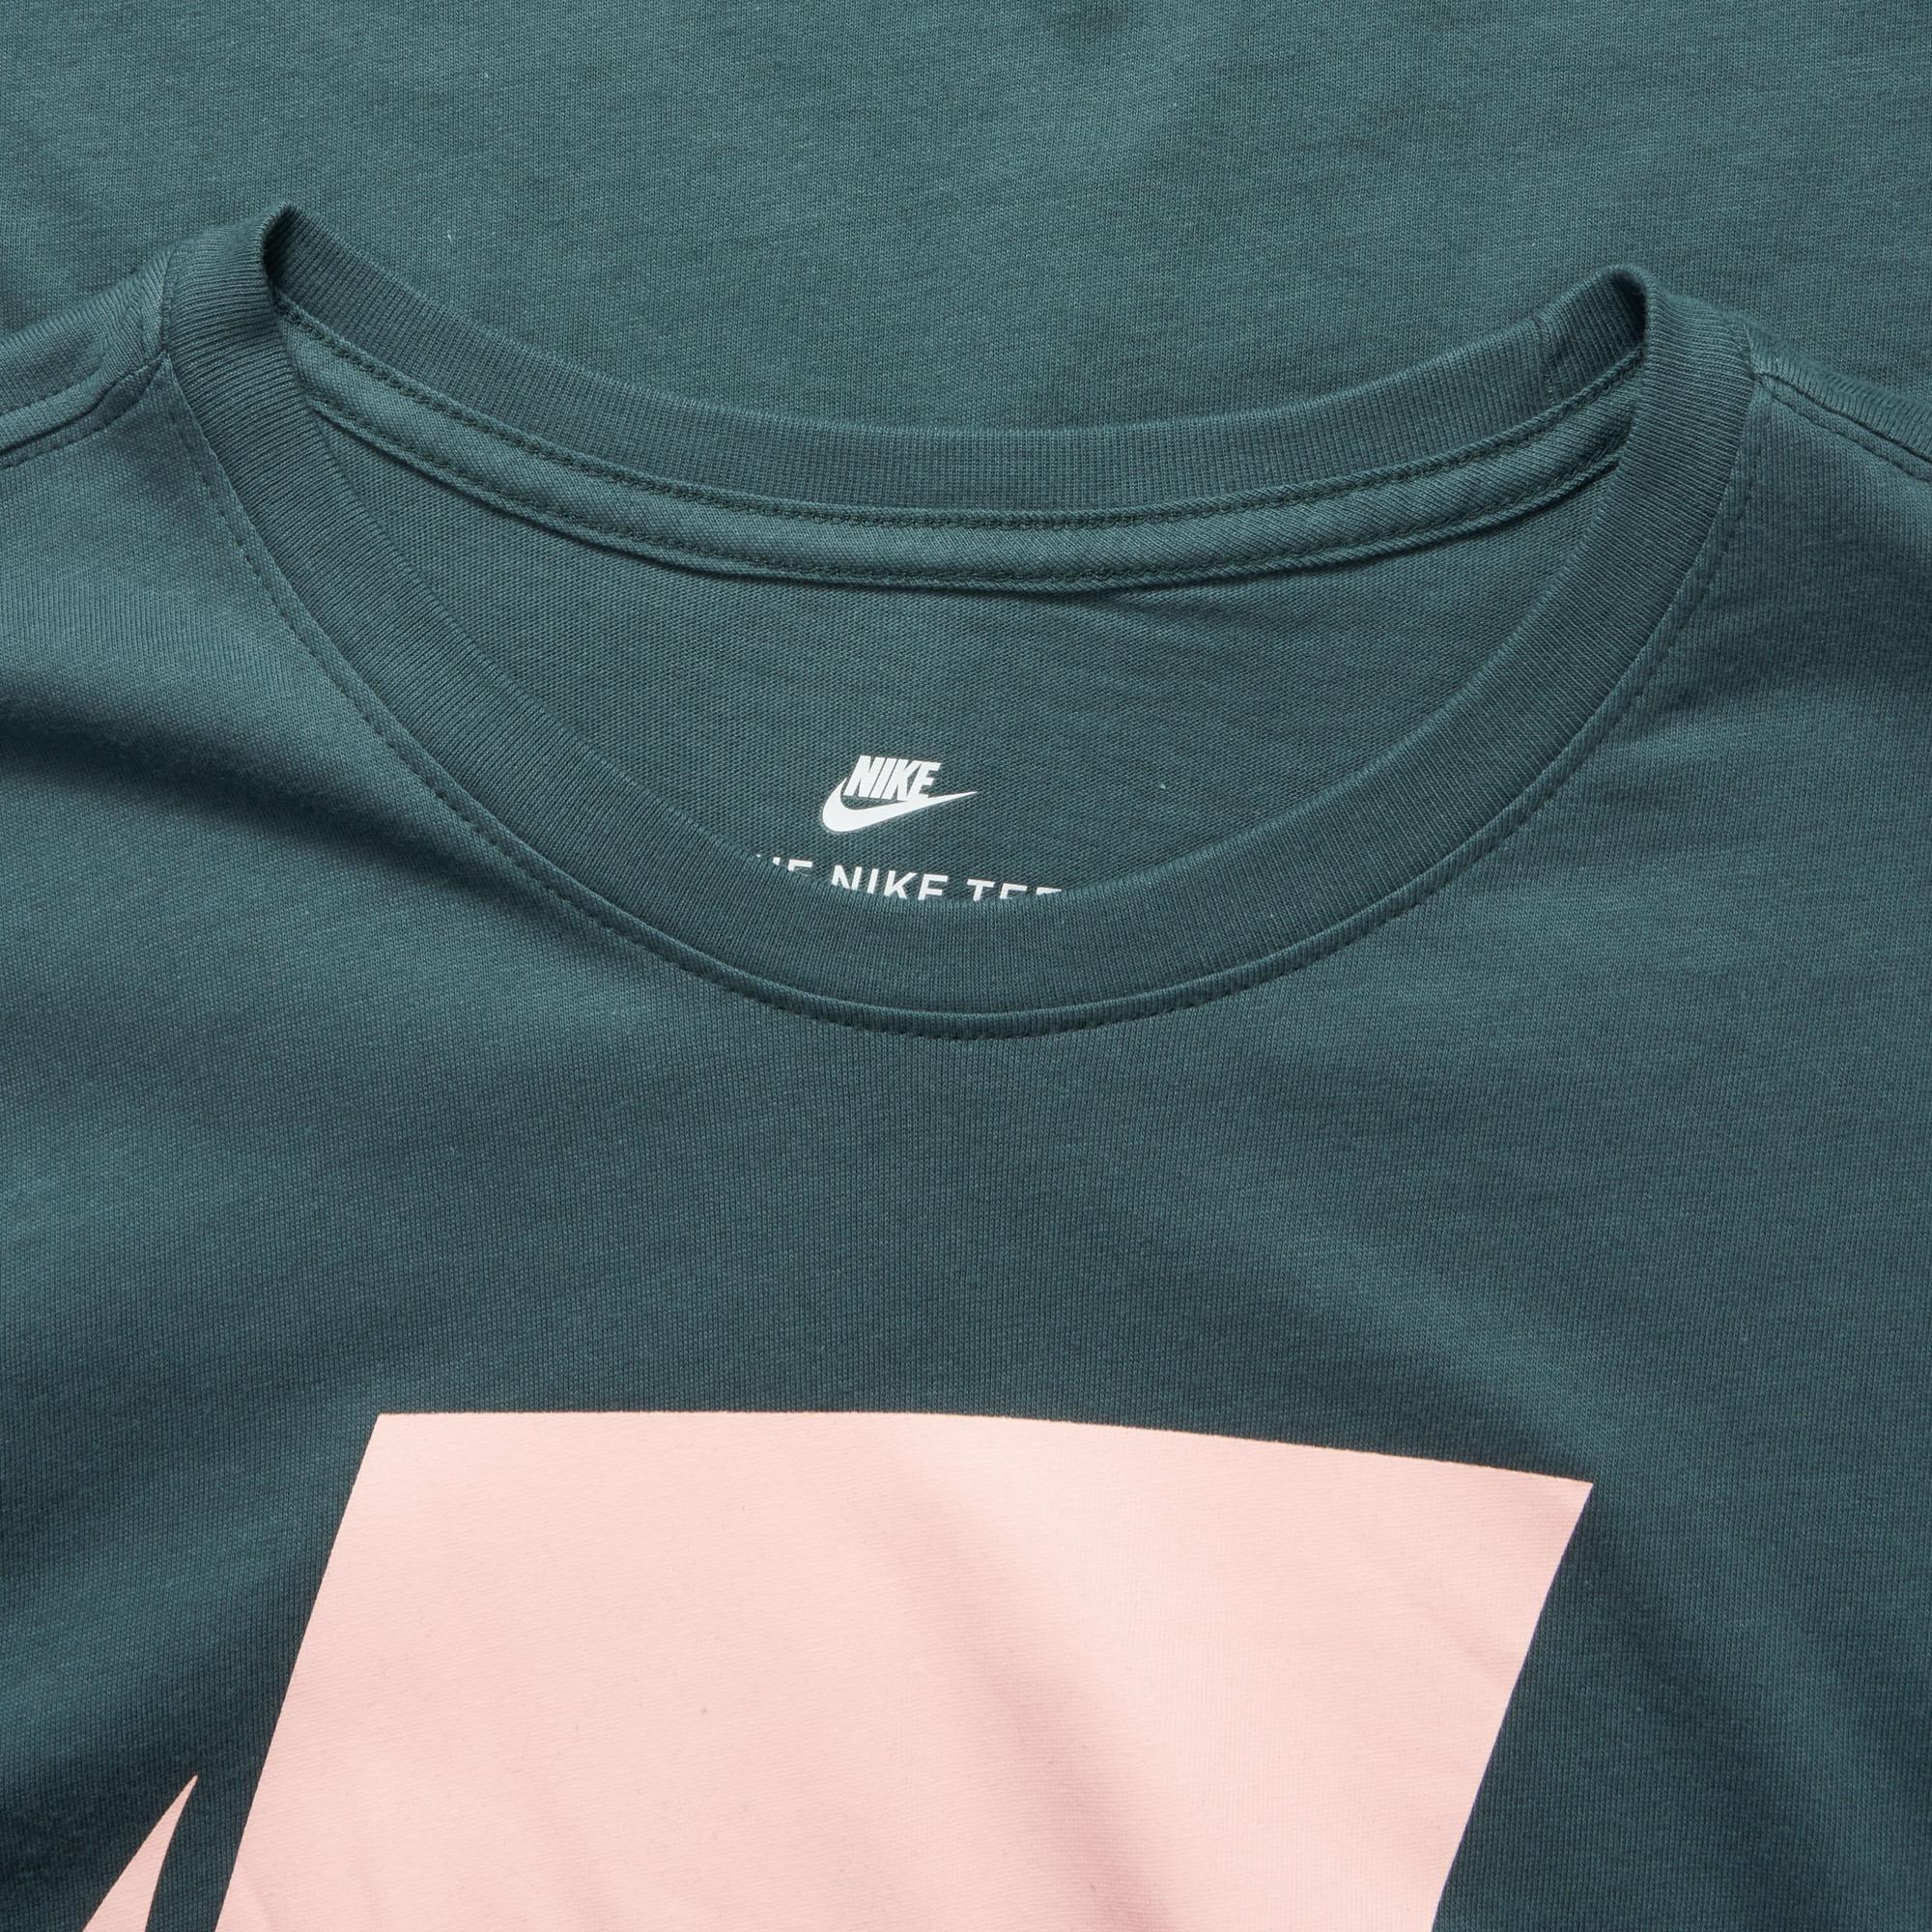 2730f36f679ec Nike Multicolor Innovation Logo T-shirt - Faded Spruce for men